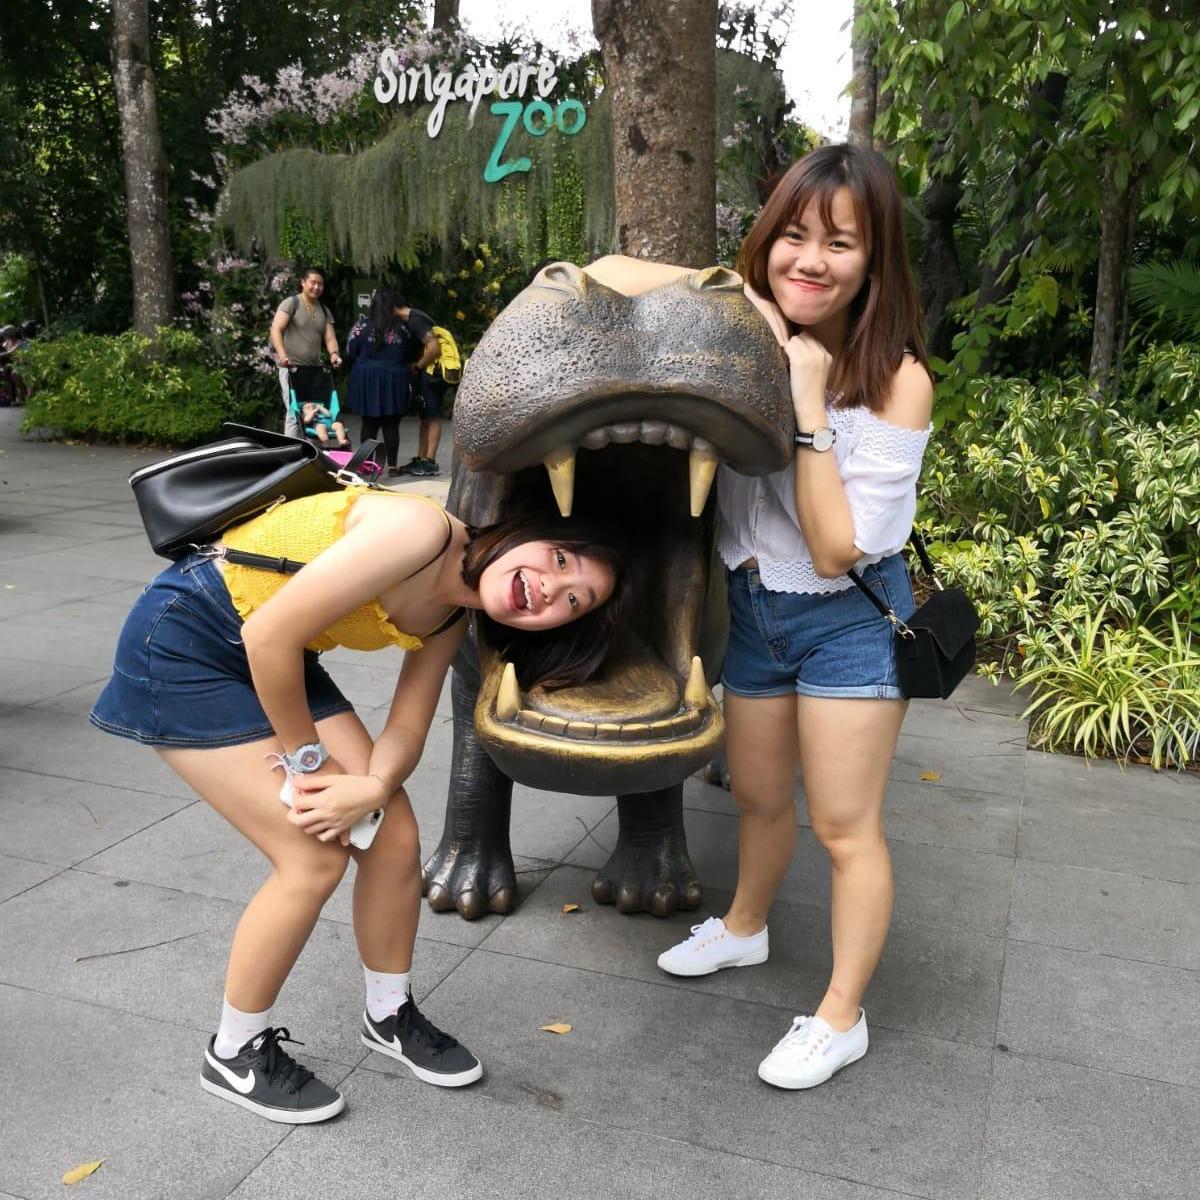 Singapore Zoo (Zoo) (Adult)【$28.0】